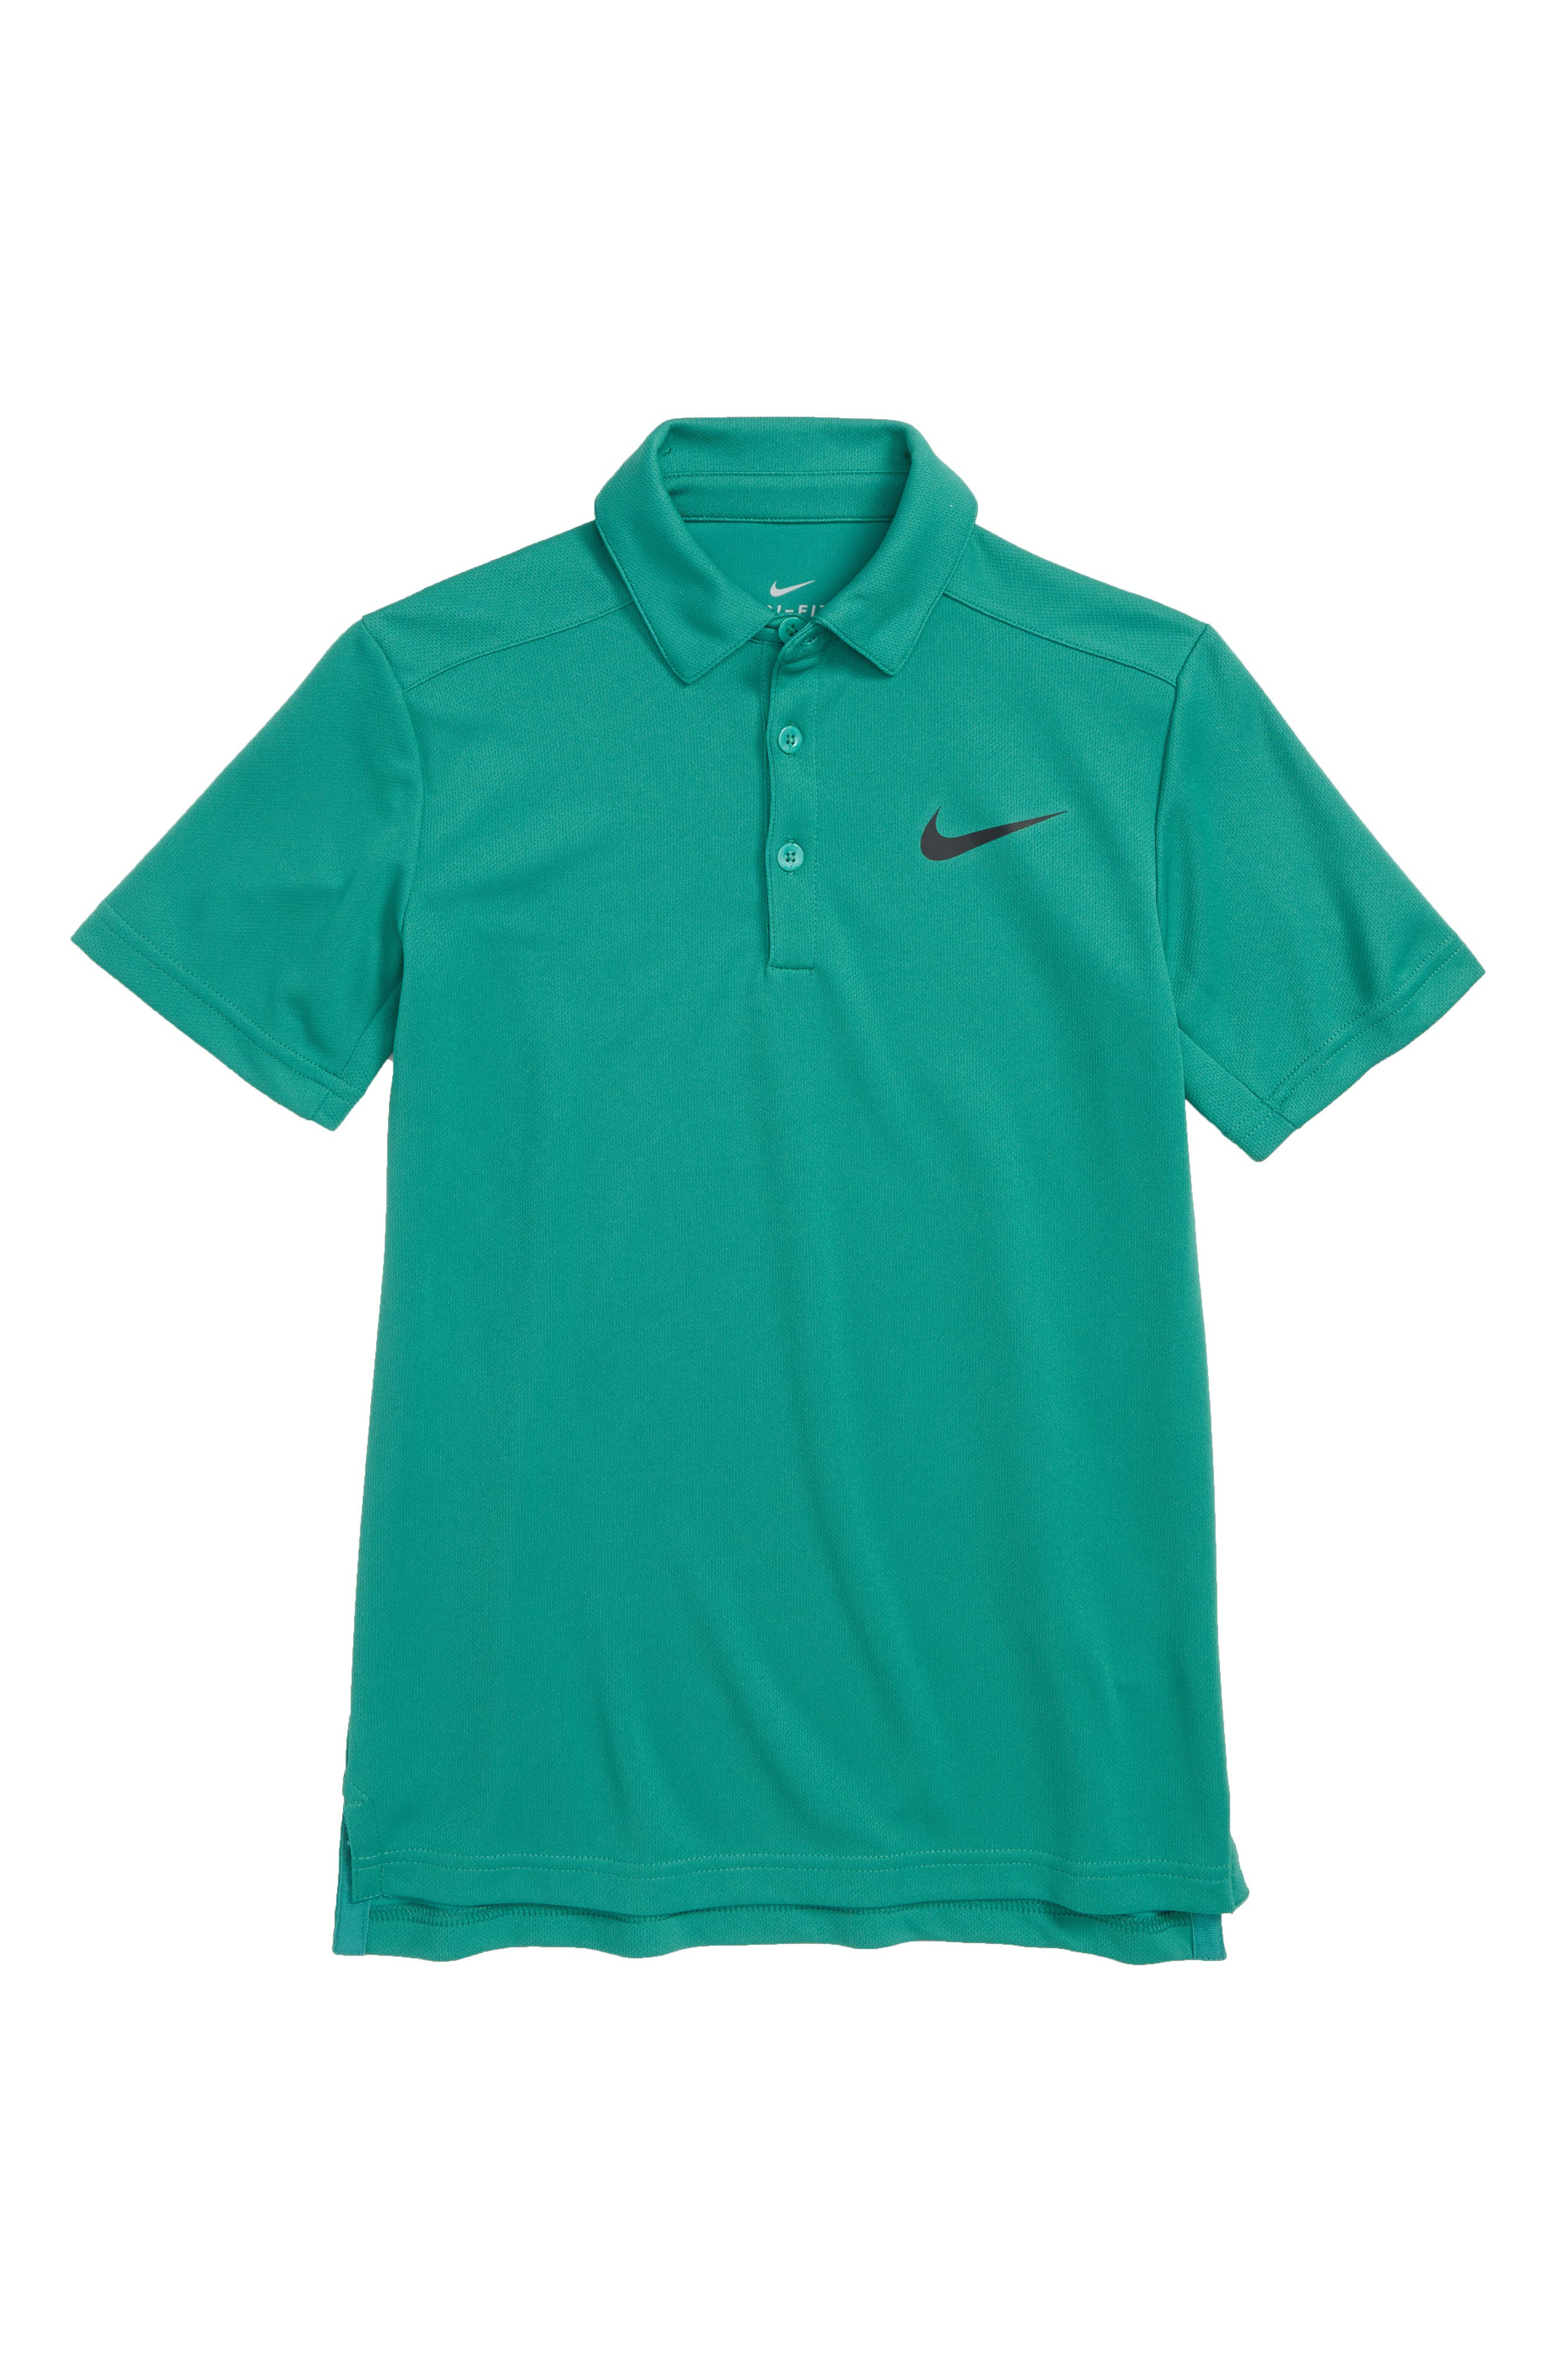 Dry Polo Shirt,                             Main thumbnail 1, color,                             368